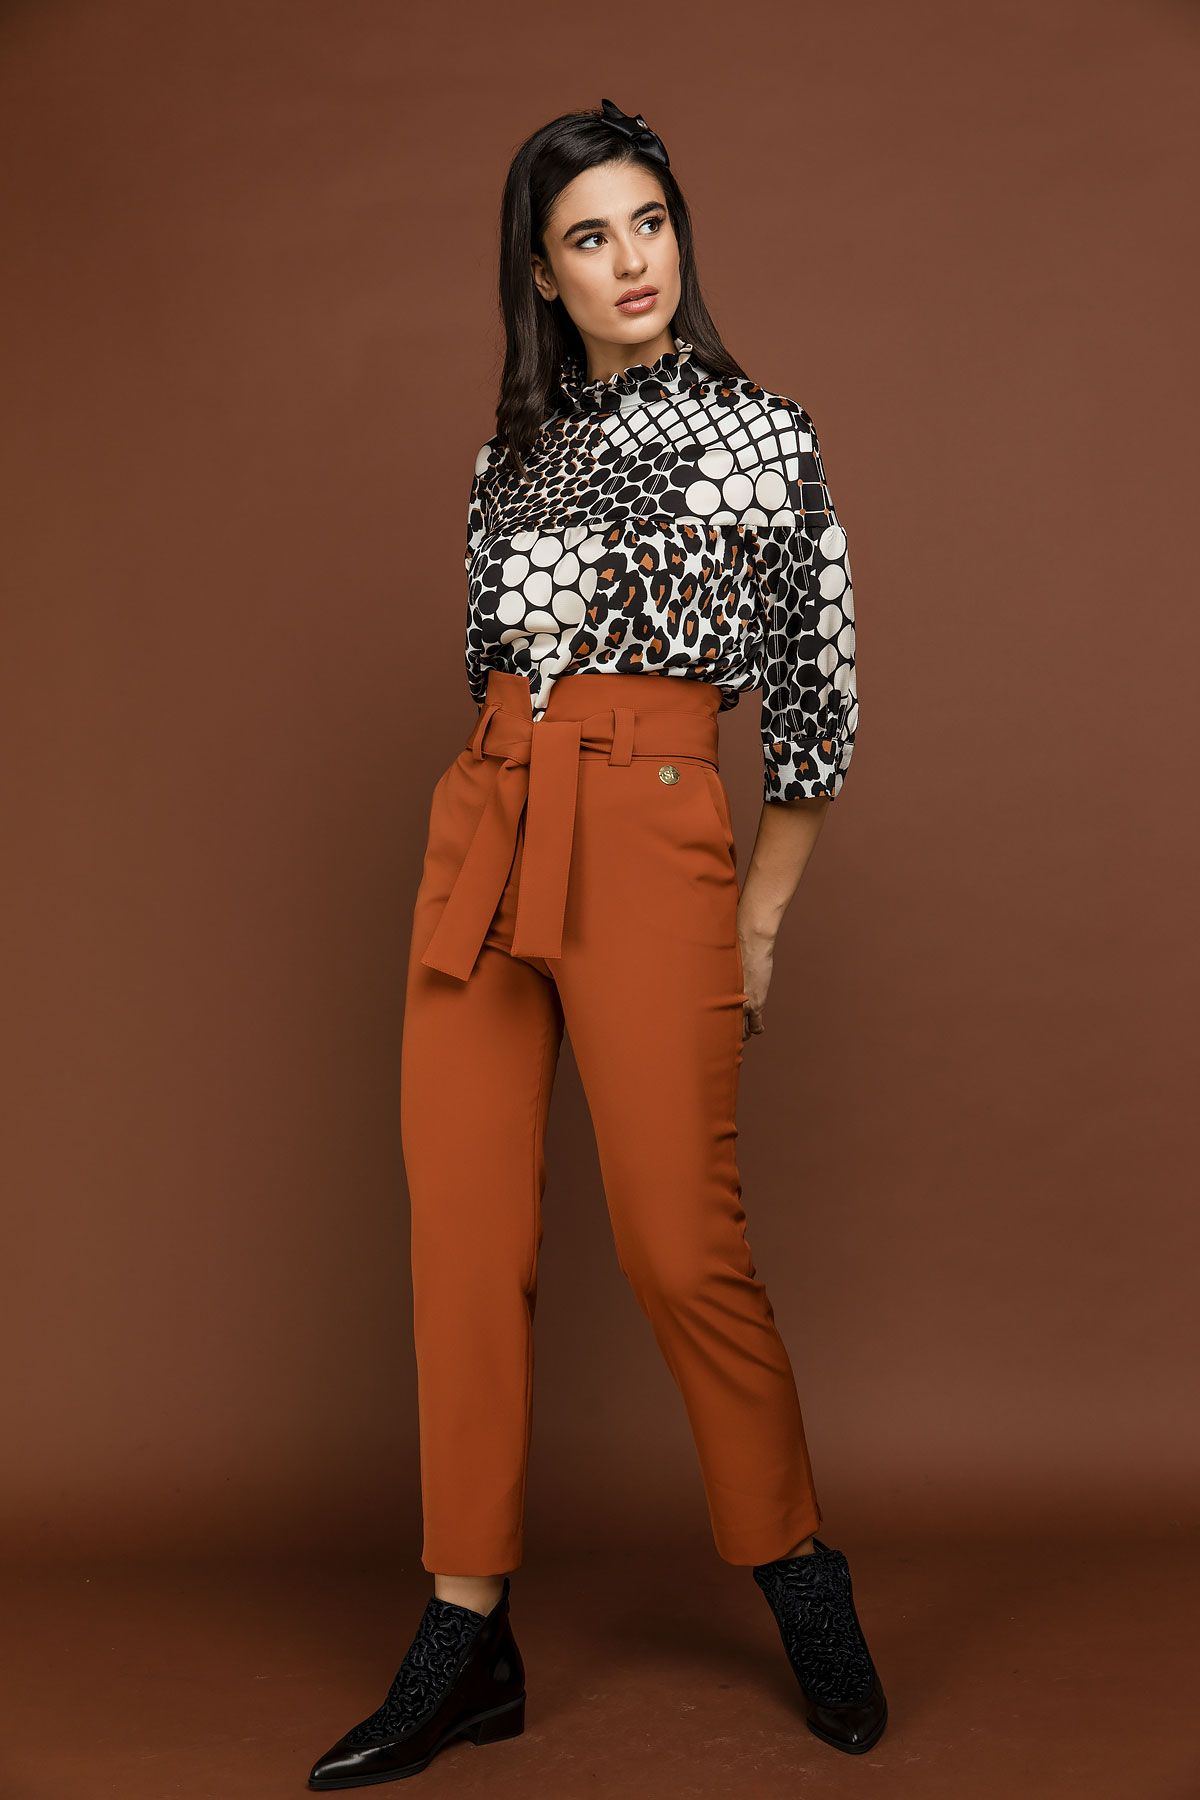 Orange High Waist Pants by Si Fashion